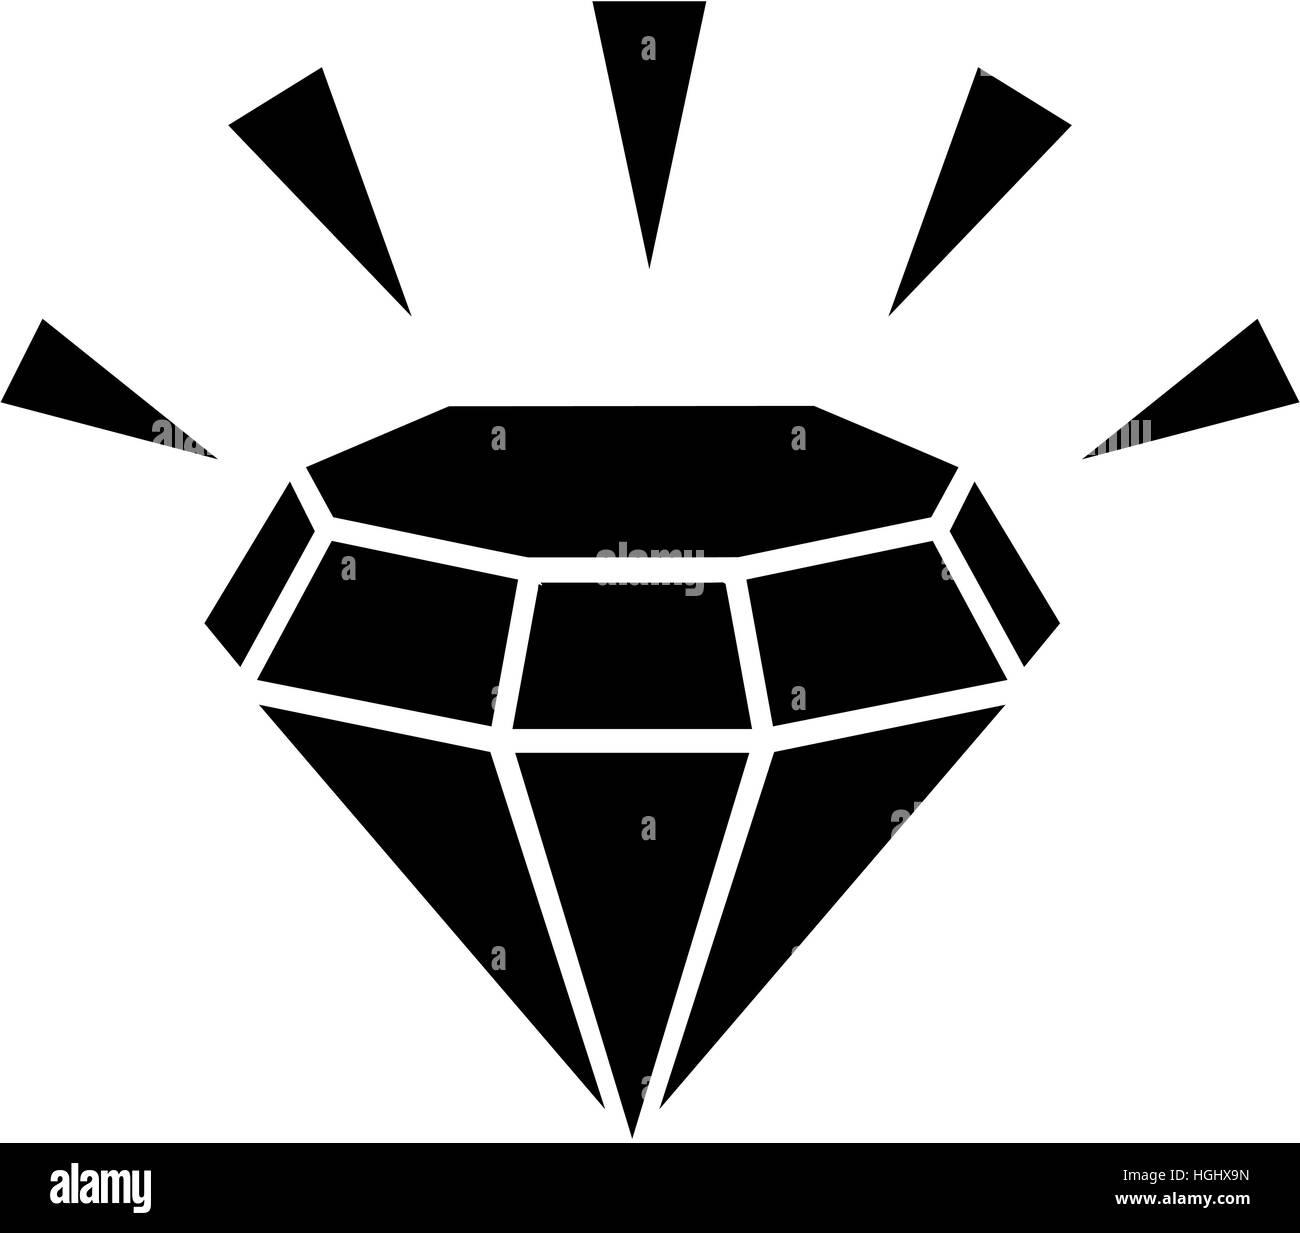 Diamond bling - Stock Image